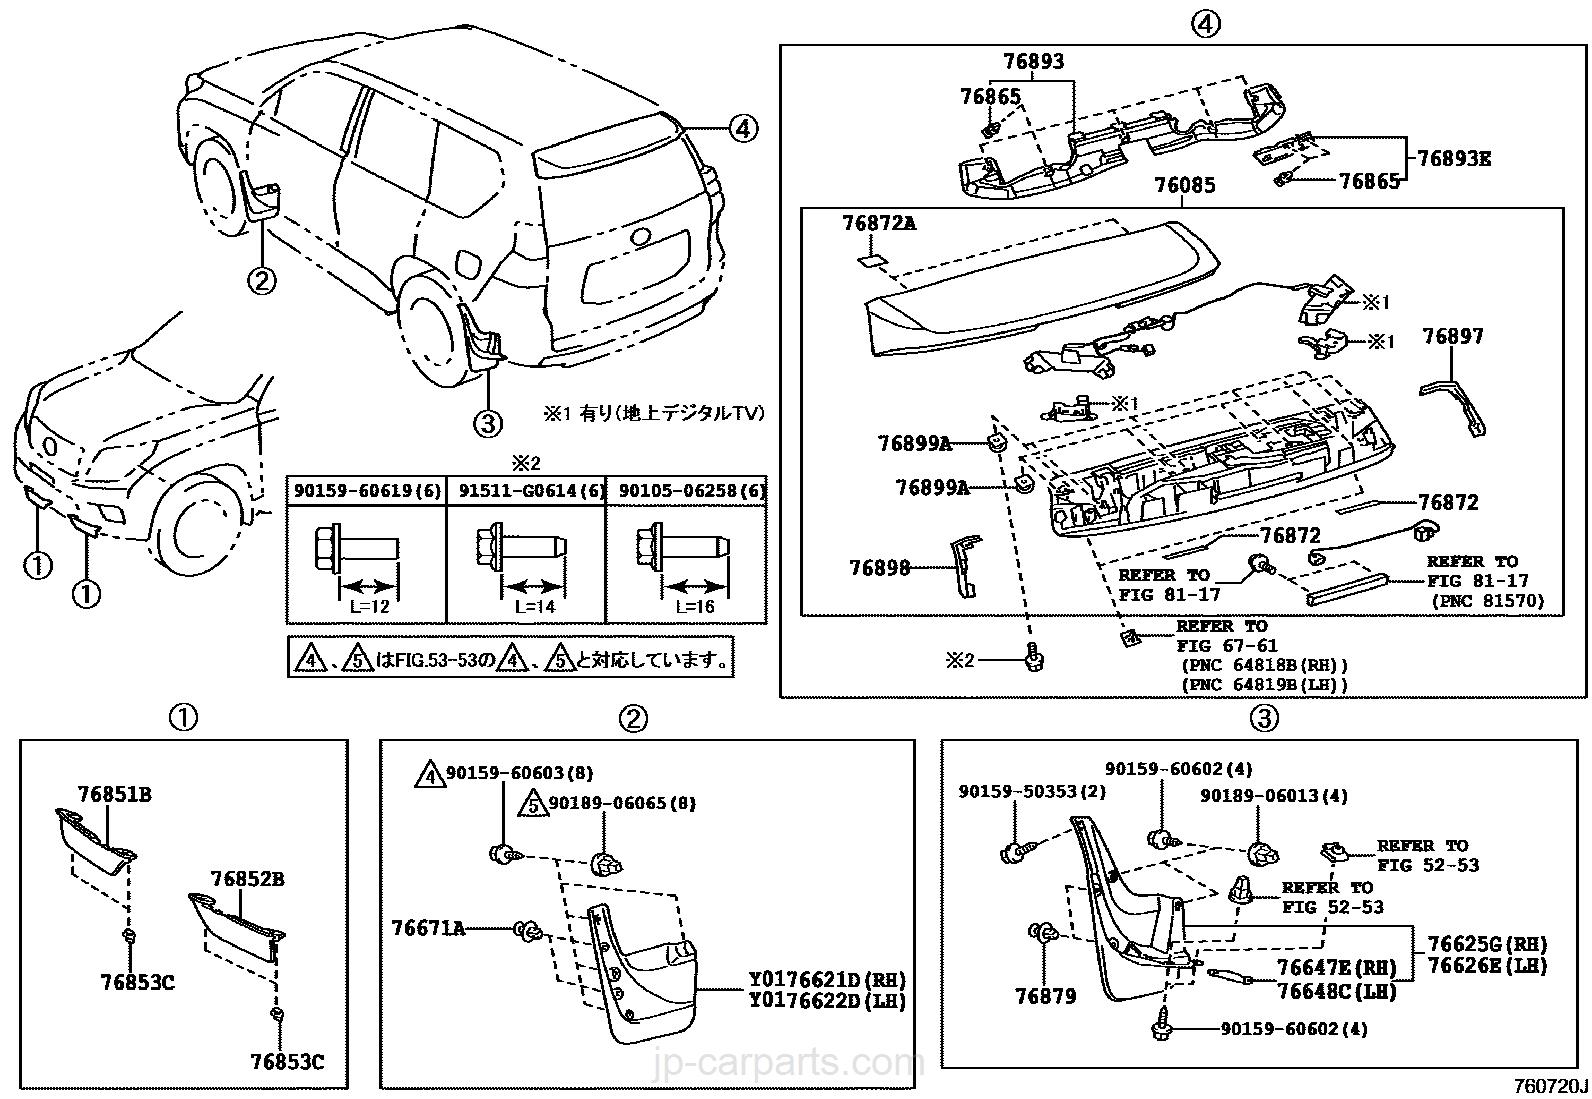 TOYOTA Genuine 71875-60100-B1 Reclining Adjuster Cover